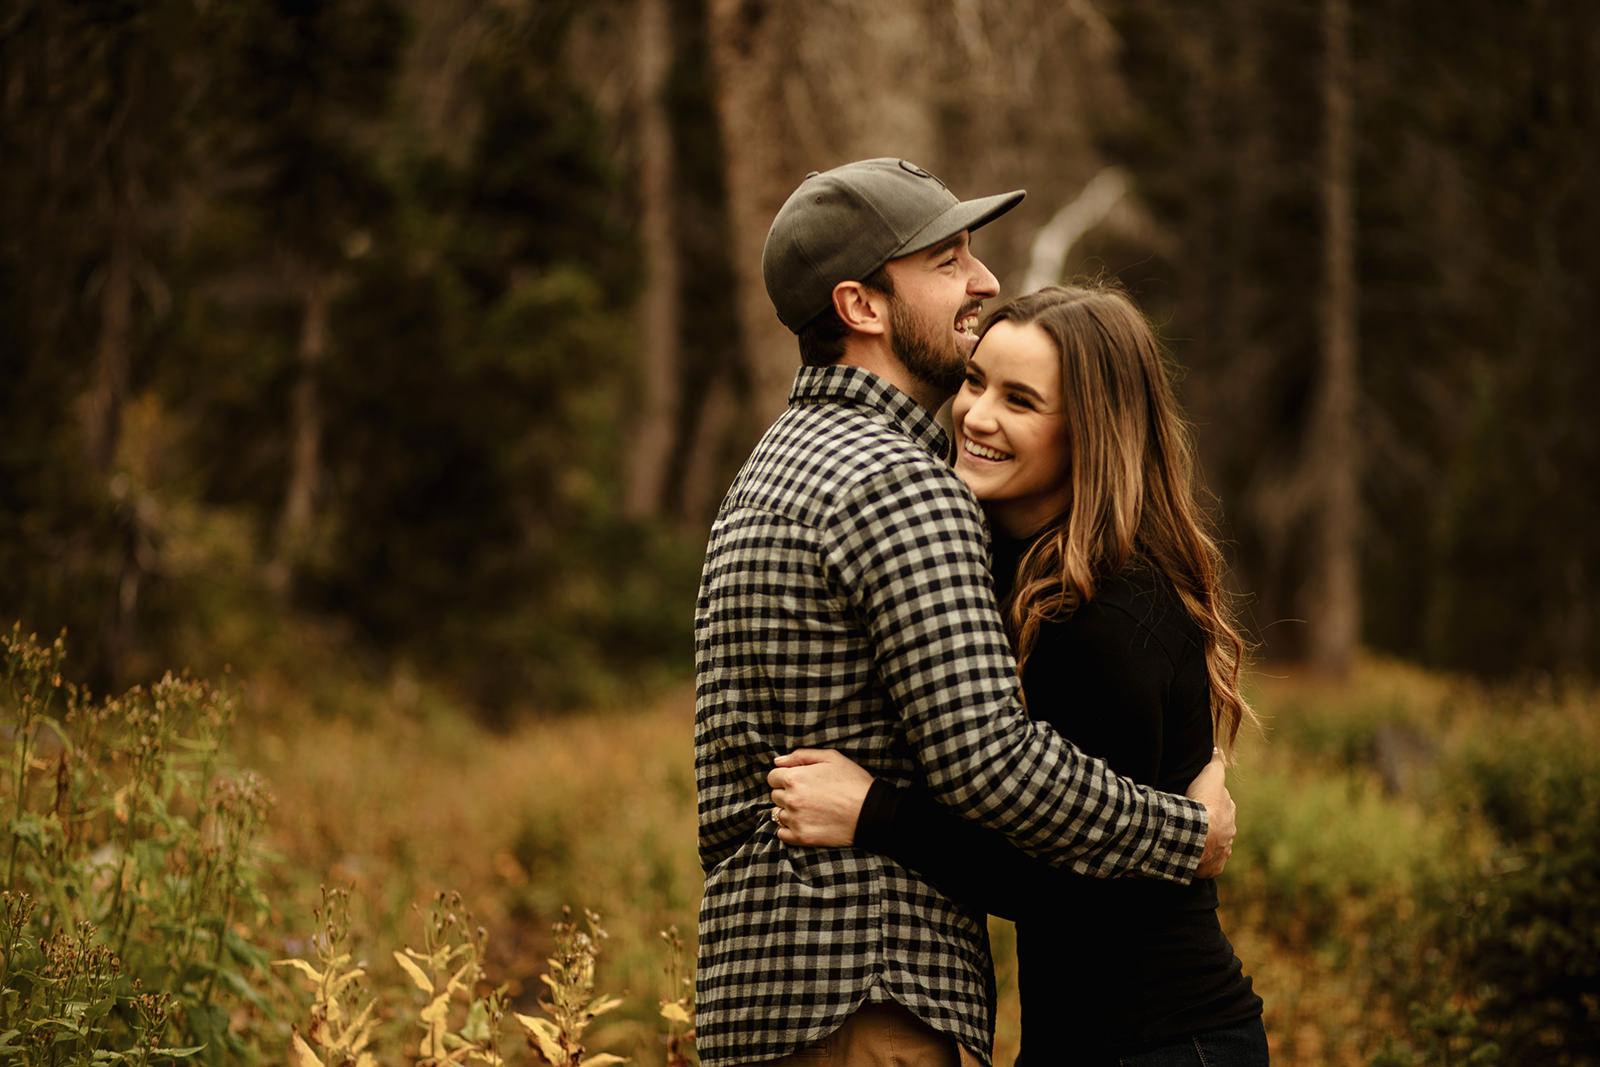 Liz Osban Photography Cheyenne Wyoming Engagement Wedding Photographer couple adventure elopement wedding laramie denver fort collins colorado rocky mountain national park4.jpg